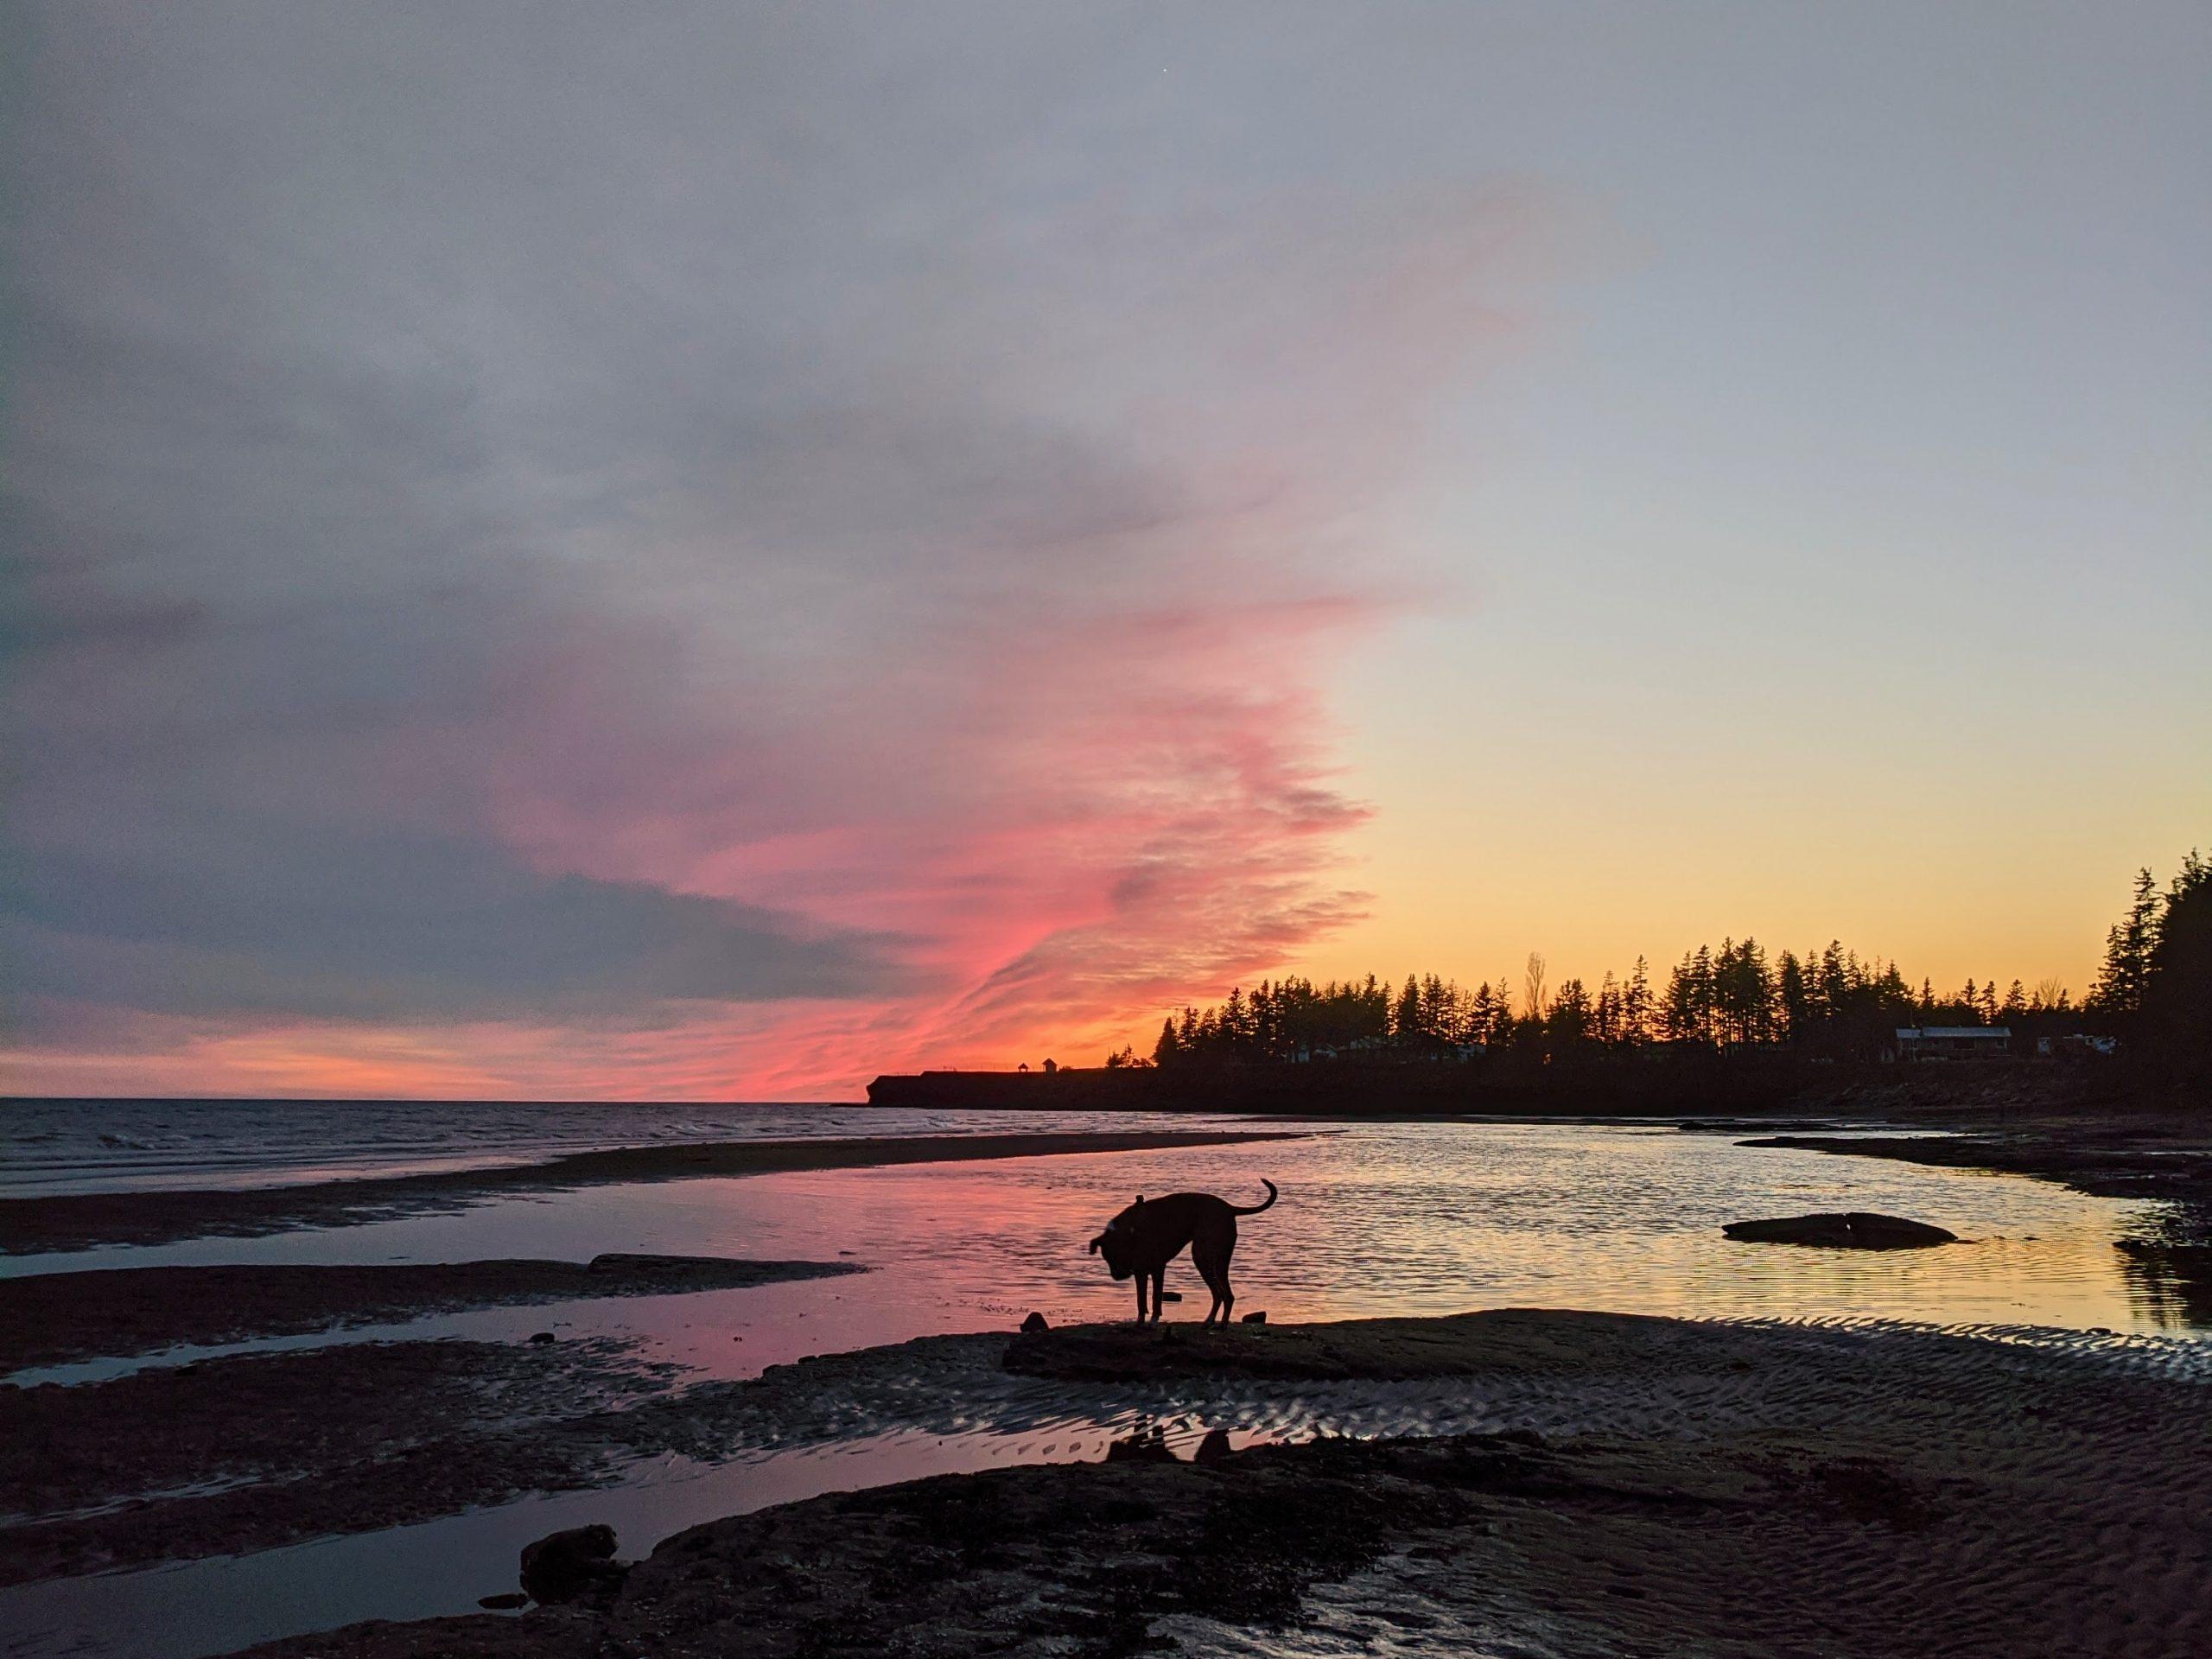 sunset with dog